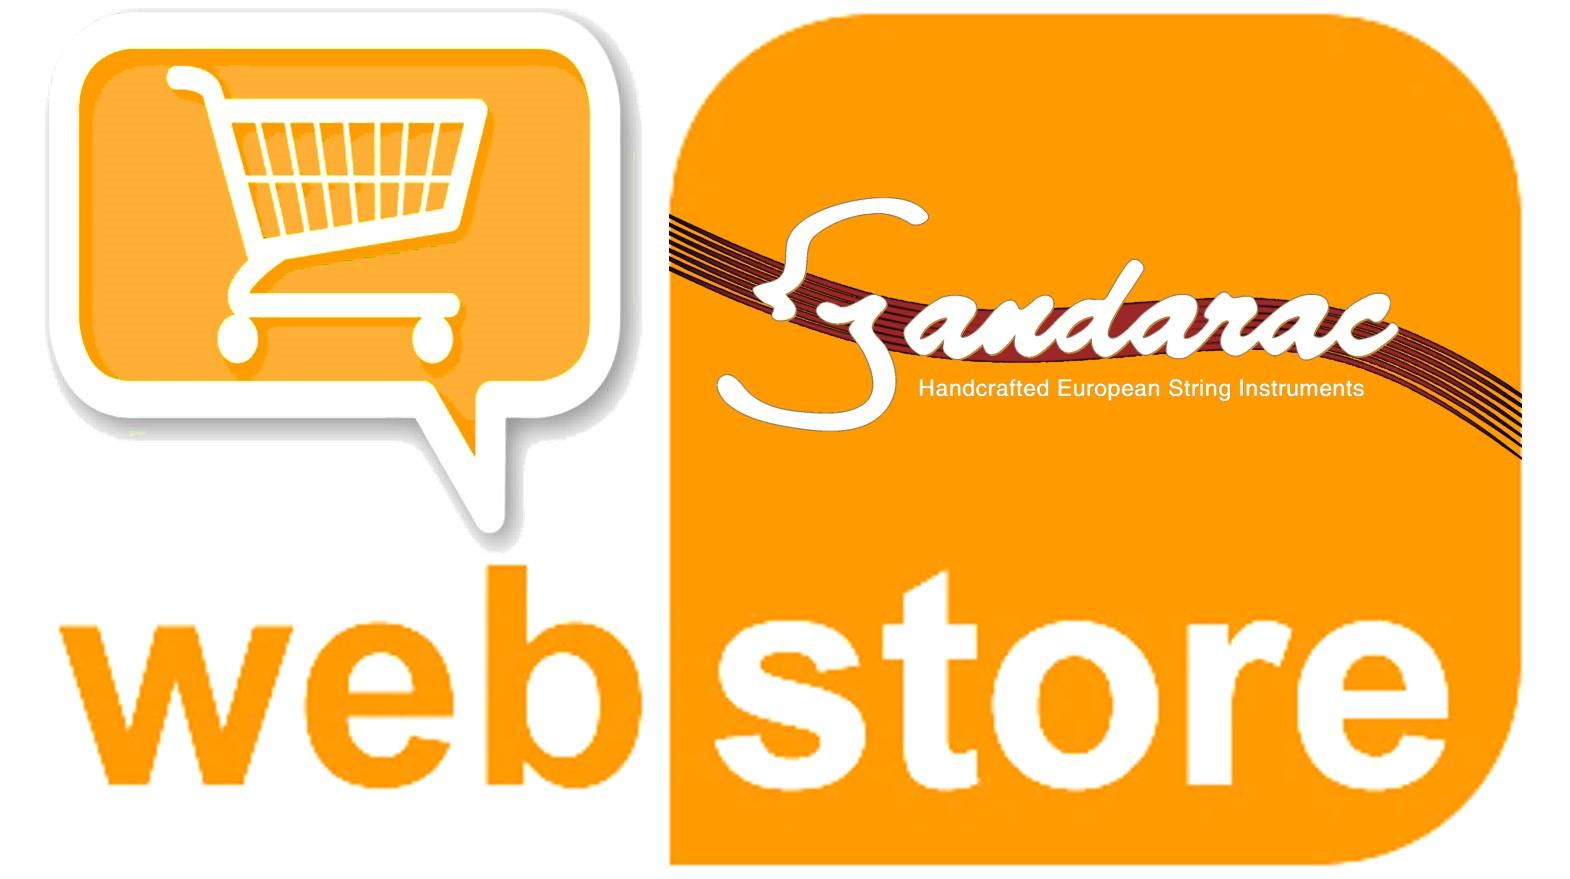 18 - web store